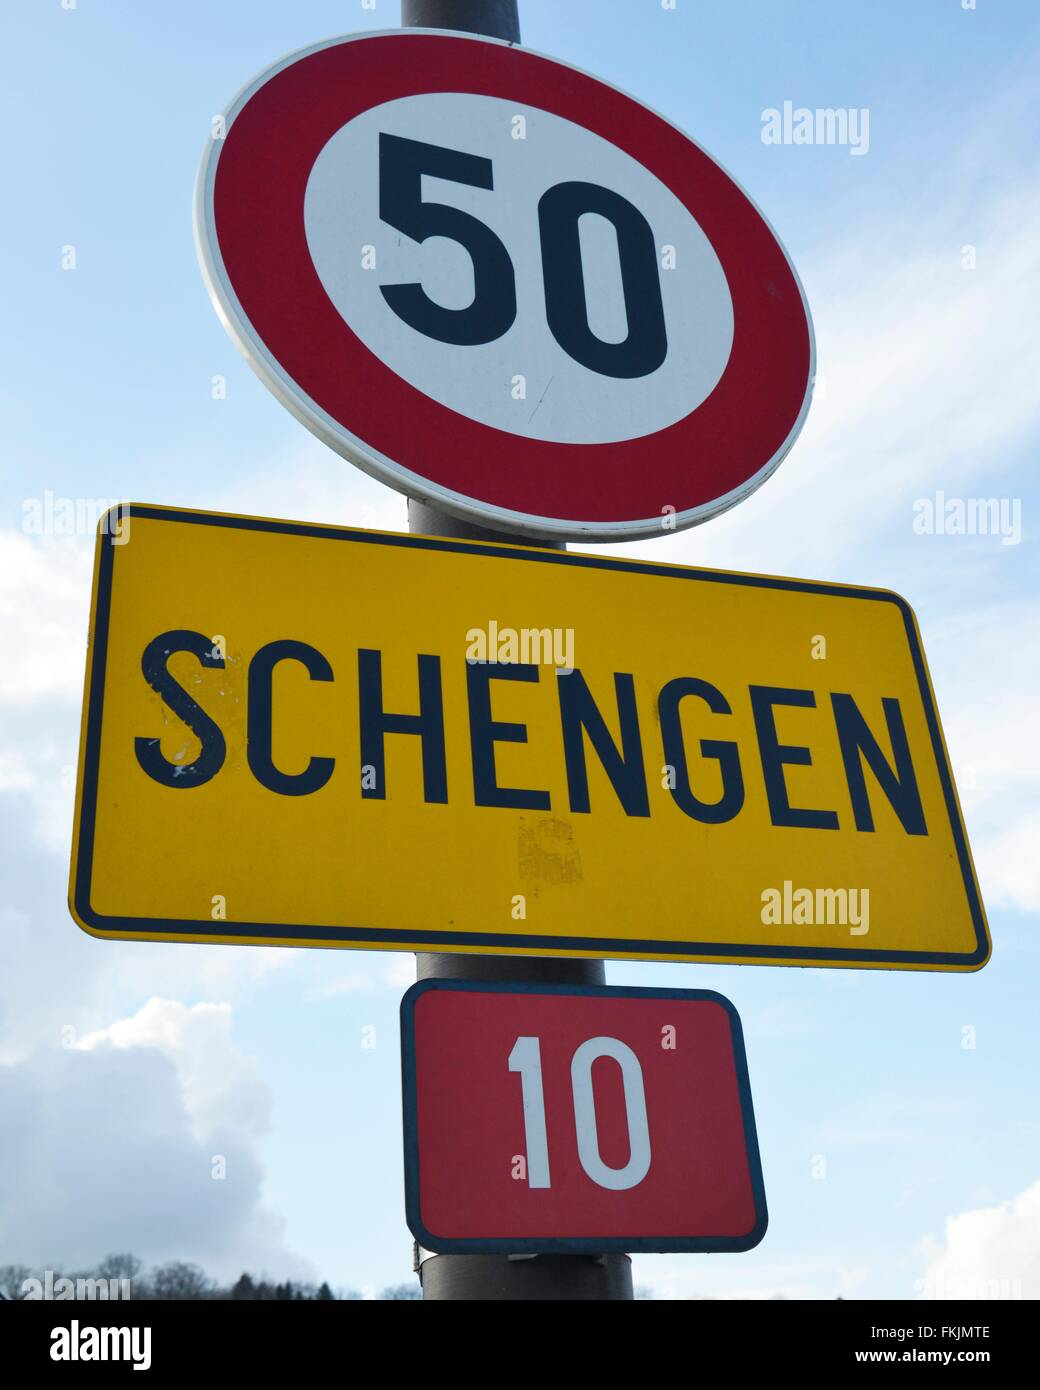 town sign Schengen, March 7, 2016. - Stock Image